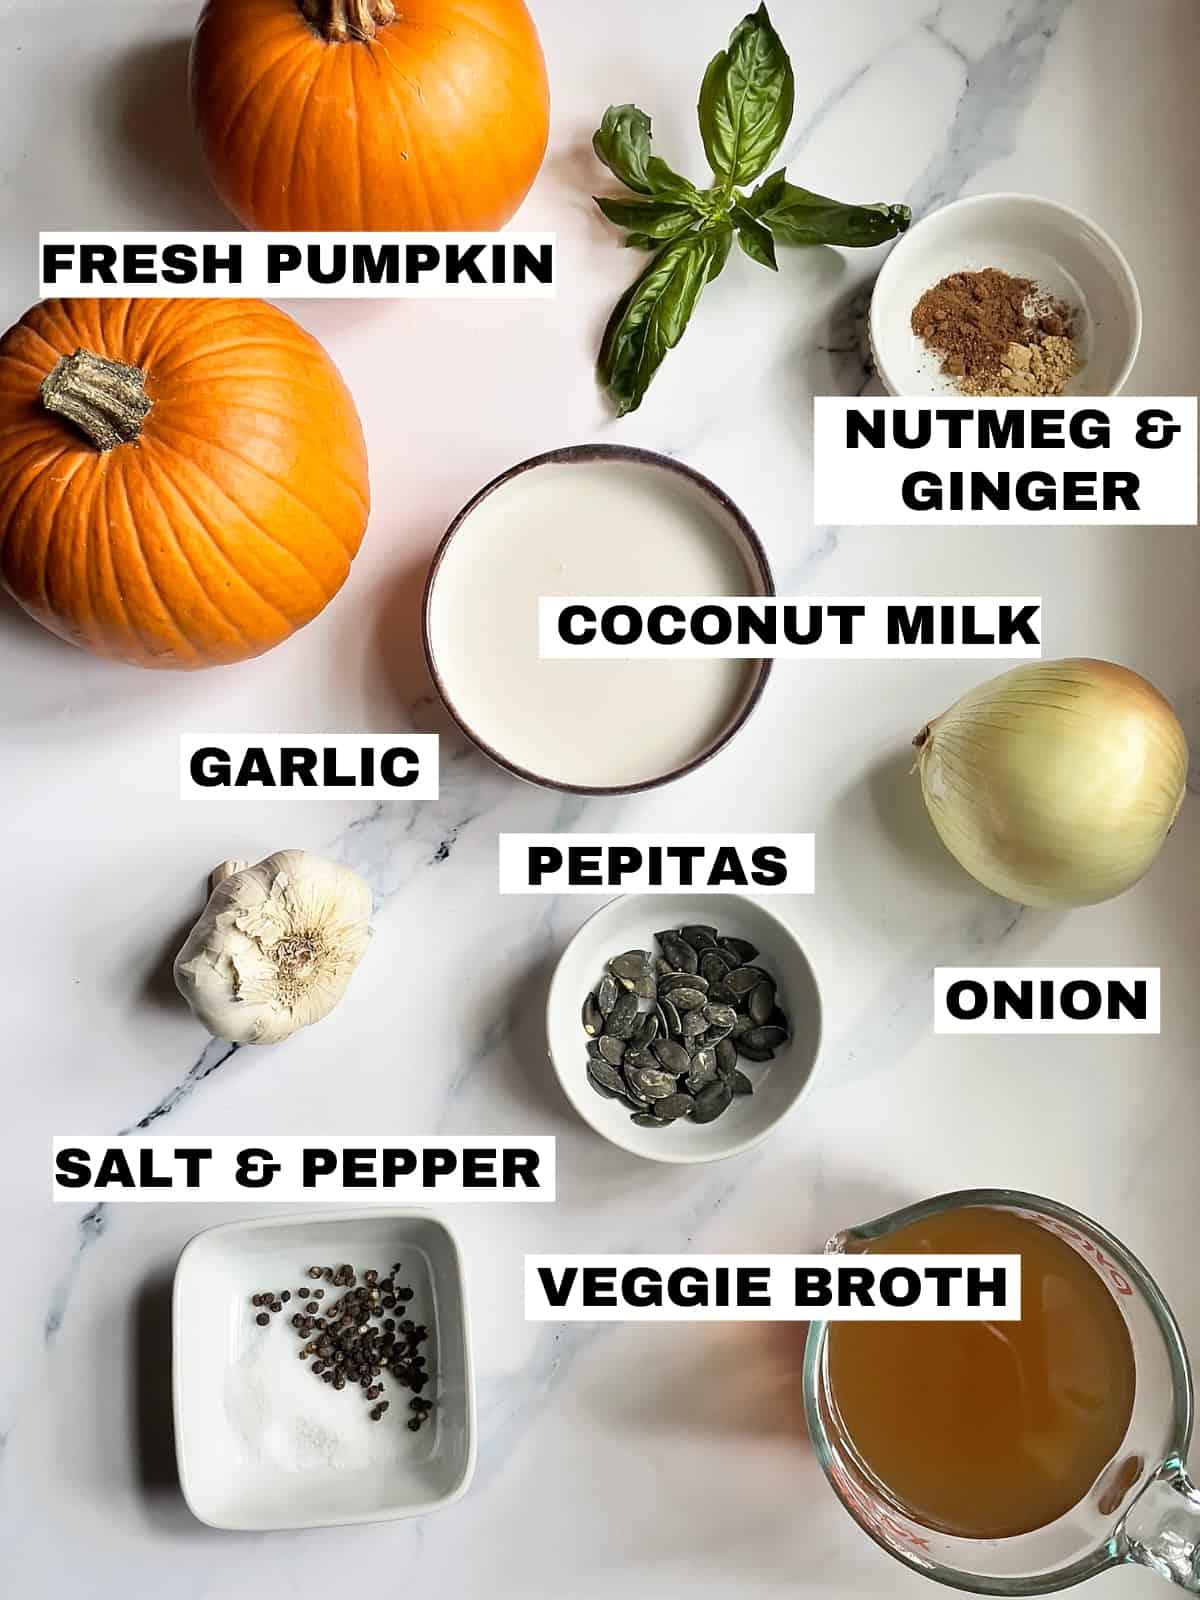 pumpkin, broth, garlic, onion, salt, pepper, nutmeg, ginger, coconut milk and basil on a white background